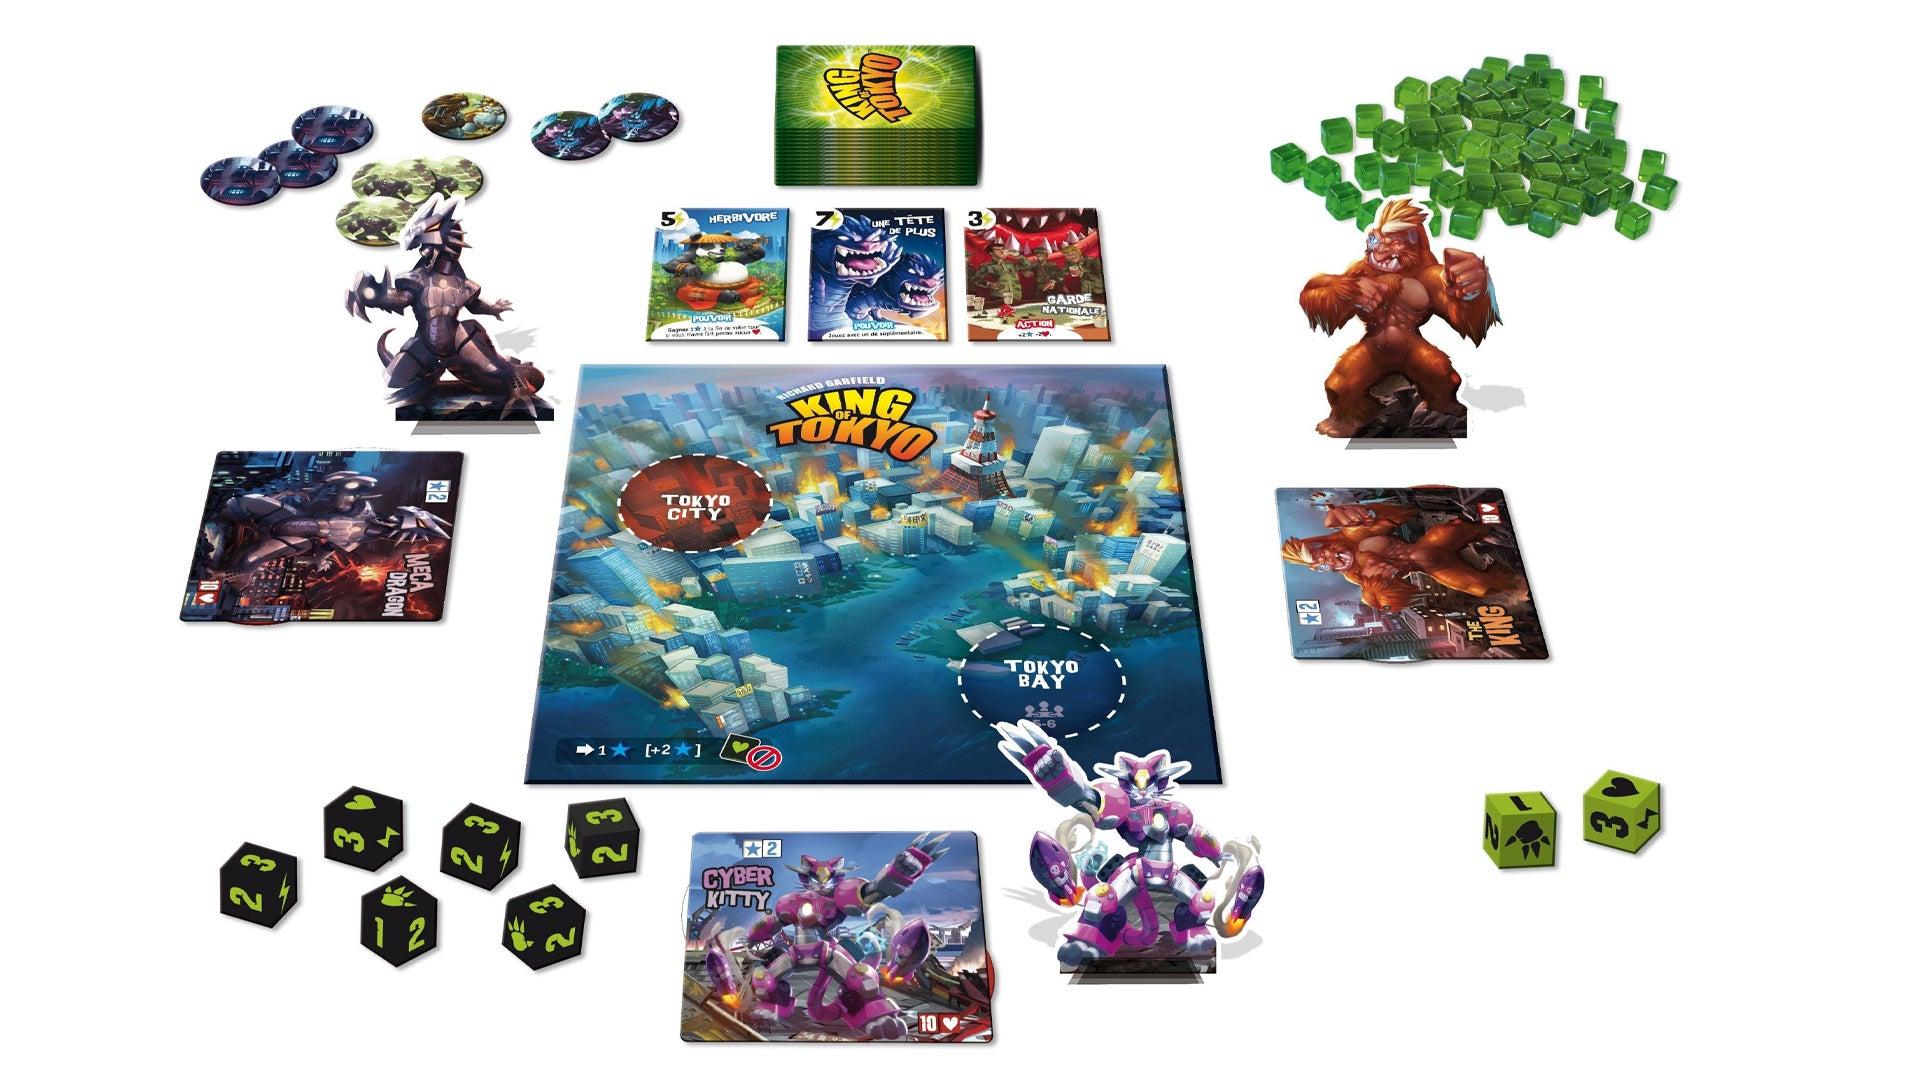 King of Tokyo beginner board game gameplay layout